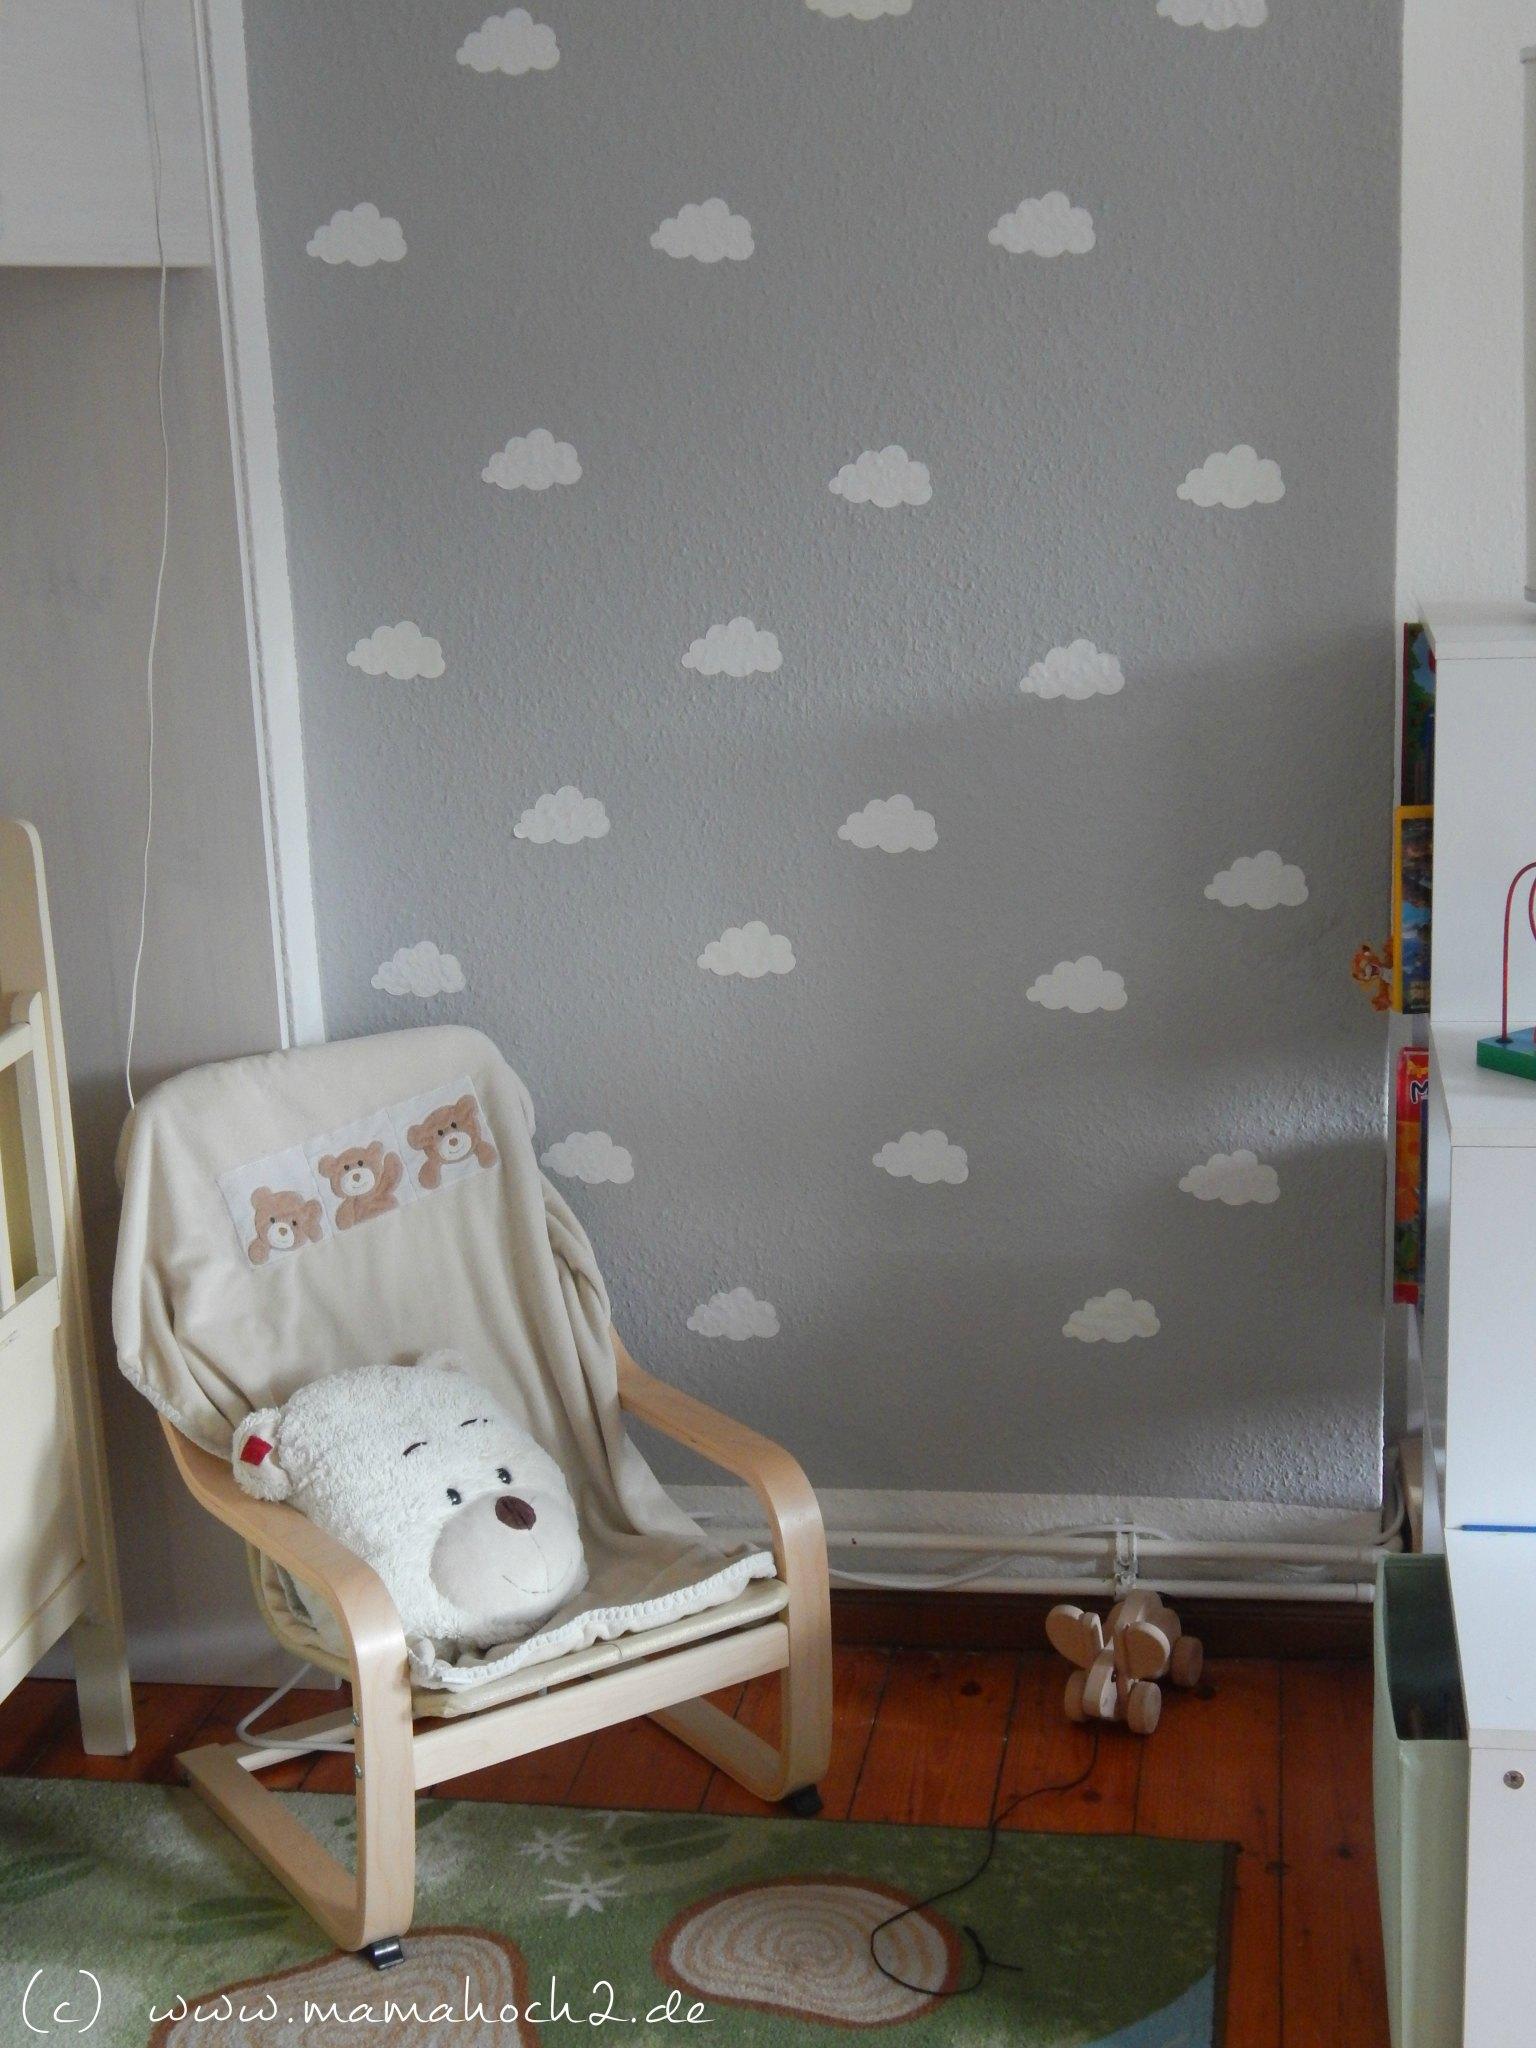 Kinderzimmer Ideen #1: Wolkenwand Tutorial u0026 Plotter ...